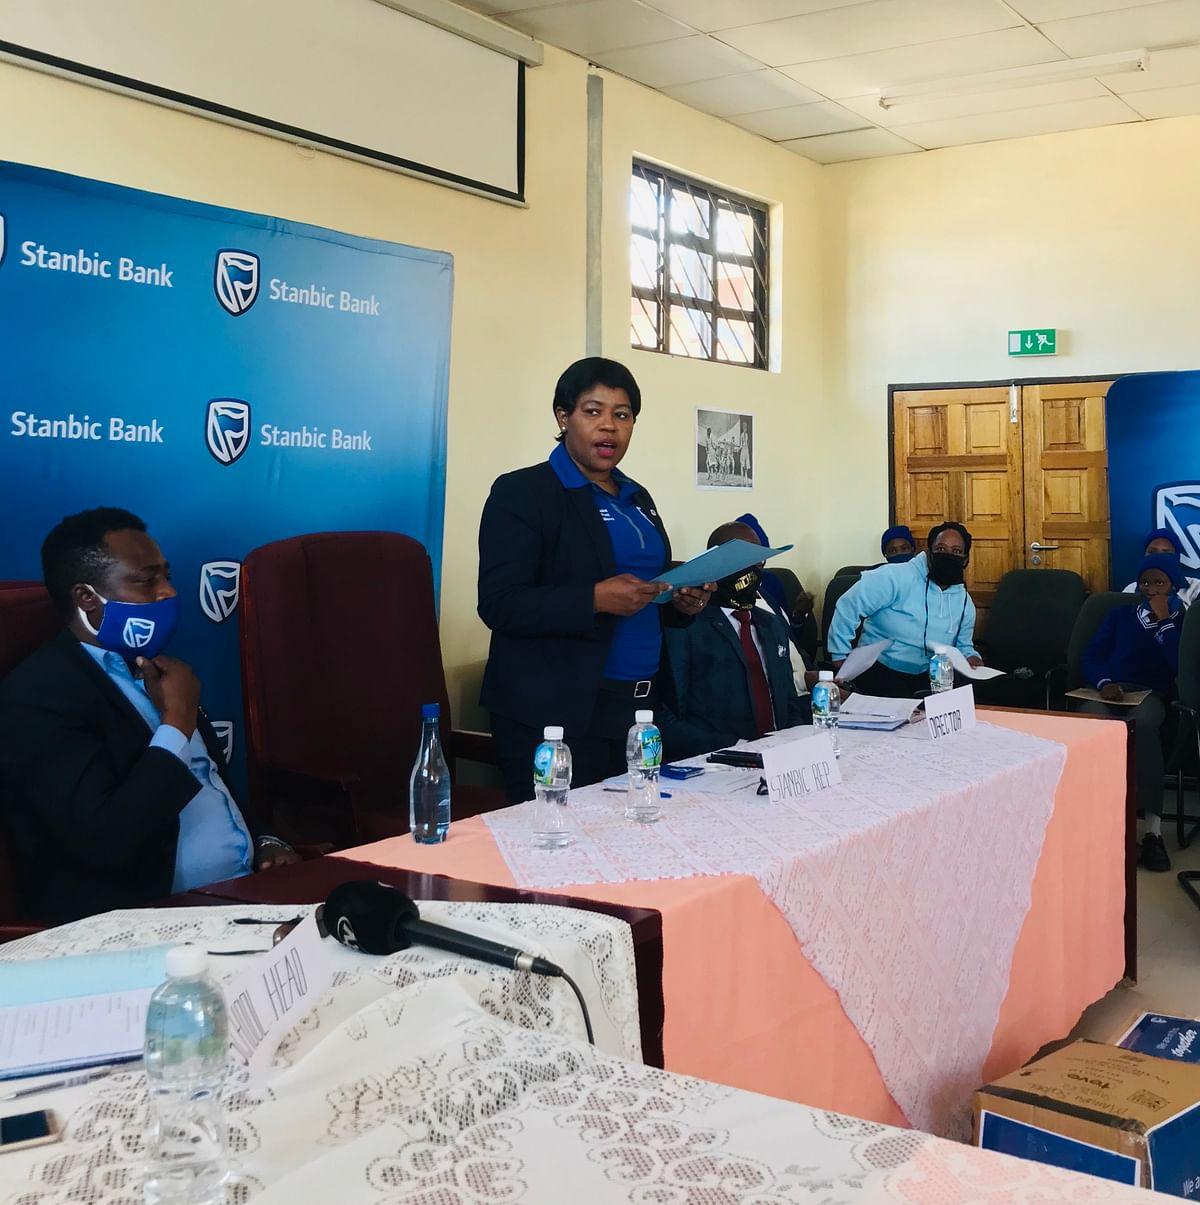 Stanbic Bank Botswana Communications Manager, Ms. Ruth Lorato Sibanda, sharing remarks on behalf of the bank.